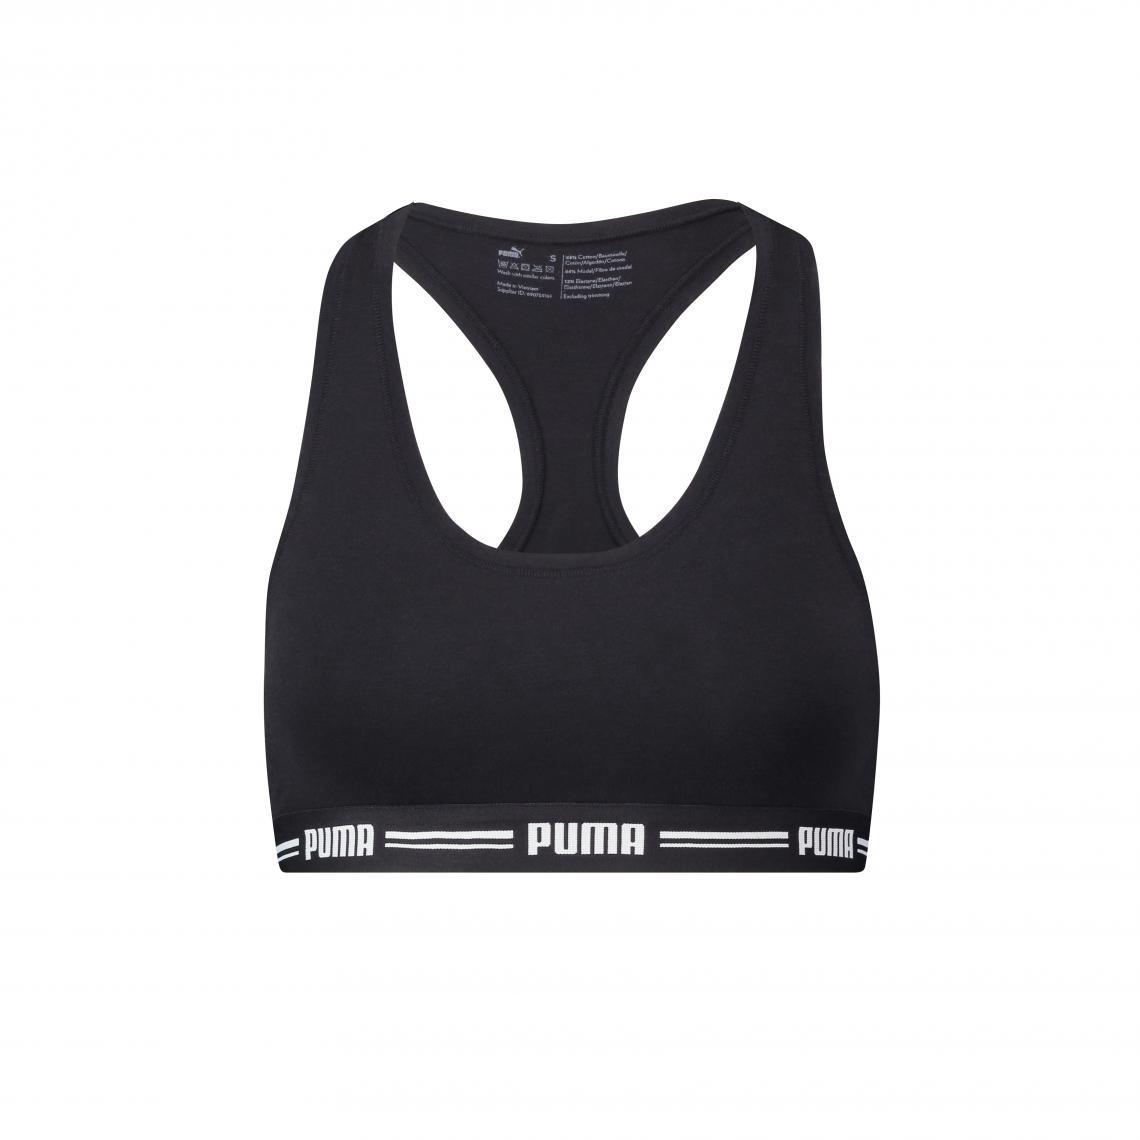 Brassière sans armatures Noire Puma - Puma femme - Modalova